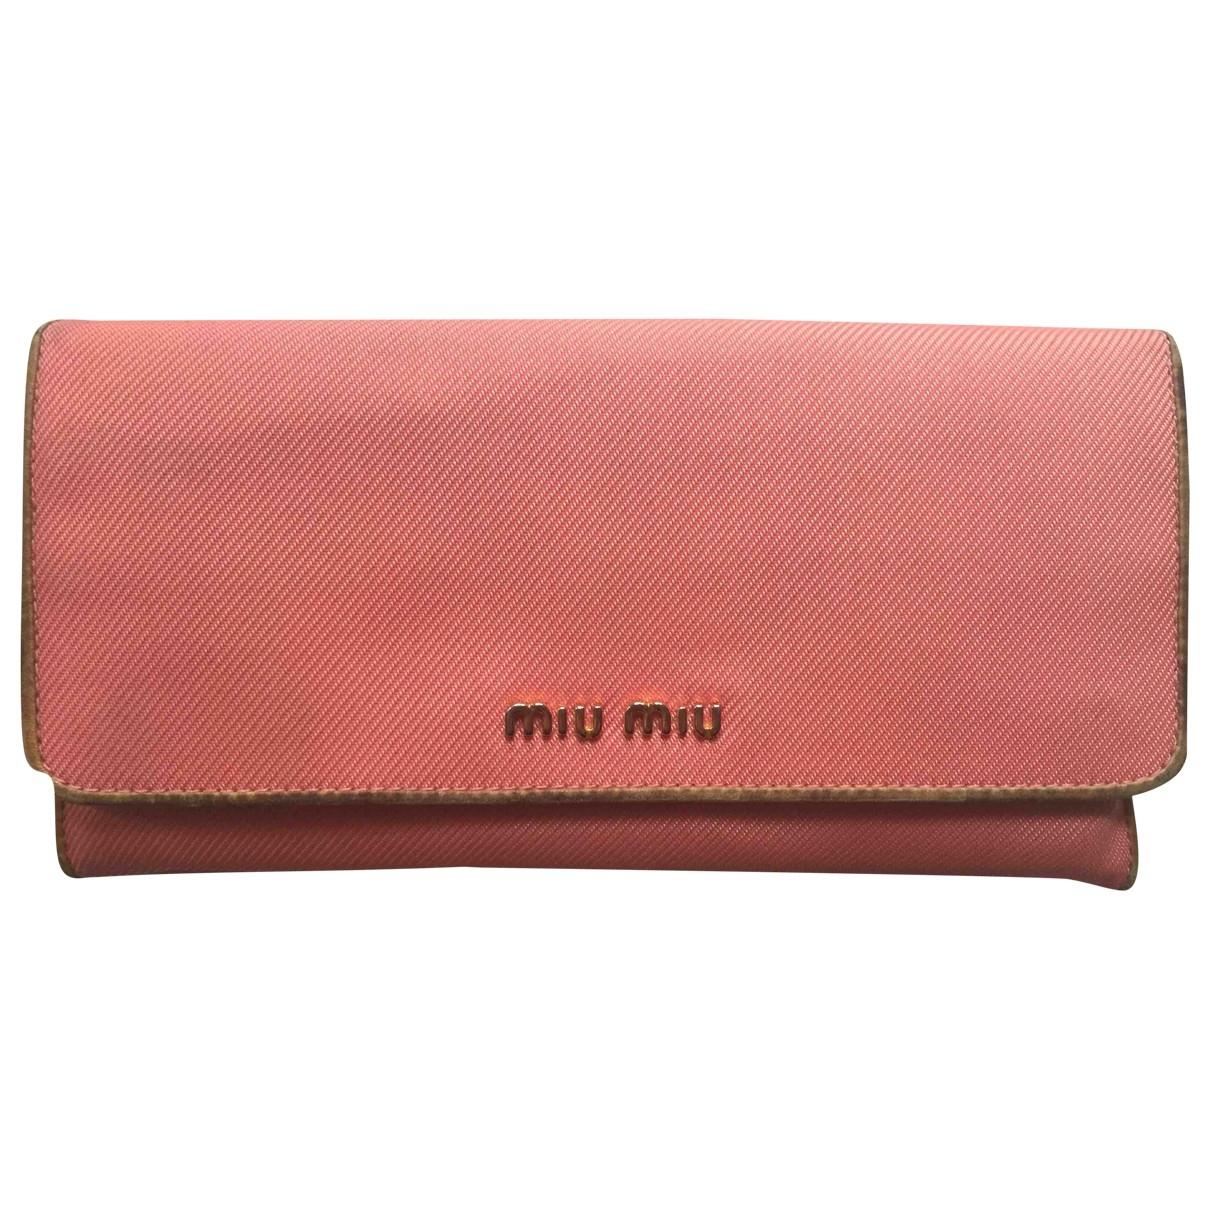 Miu Miu - Portefeuille   pour femme en toile - orange